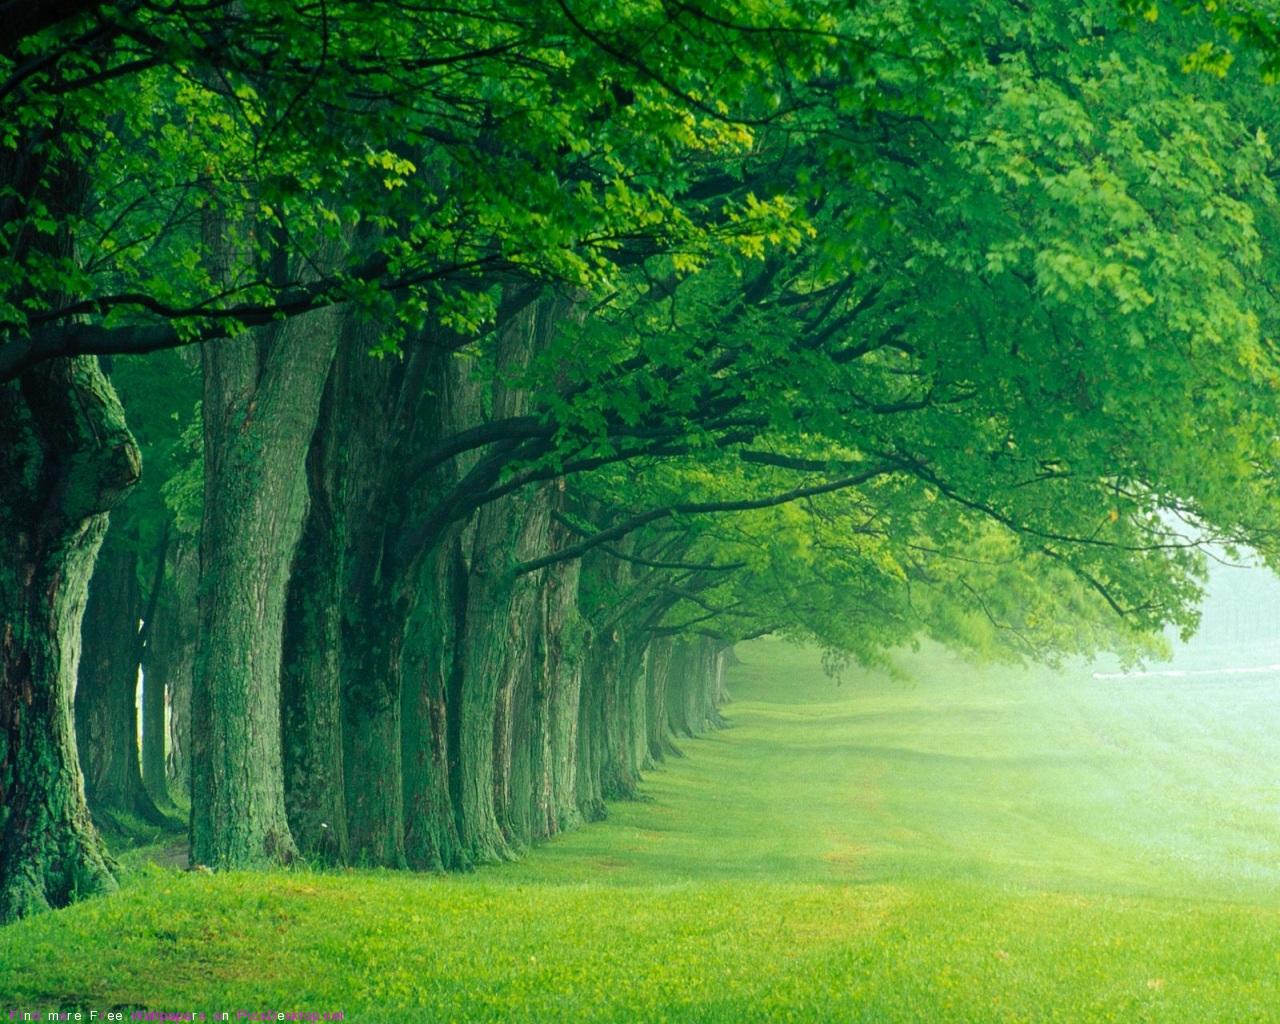 http://3.bp.blogspot.com/-6iKTY762HFo/TkCYaxpl-JI/AAAAAAAAG-w/HVneLxVKQHA/s1600/Green_Forest-wallpaper.jpg